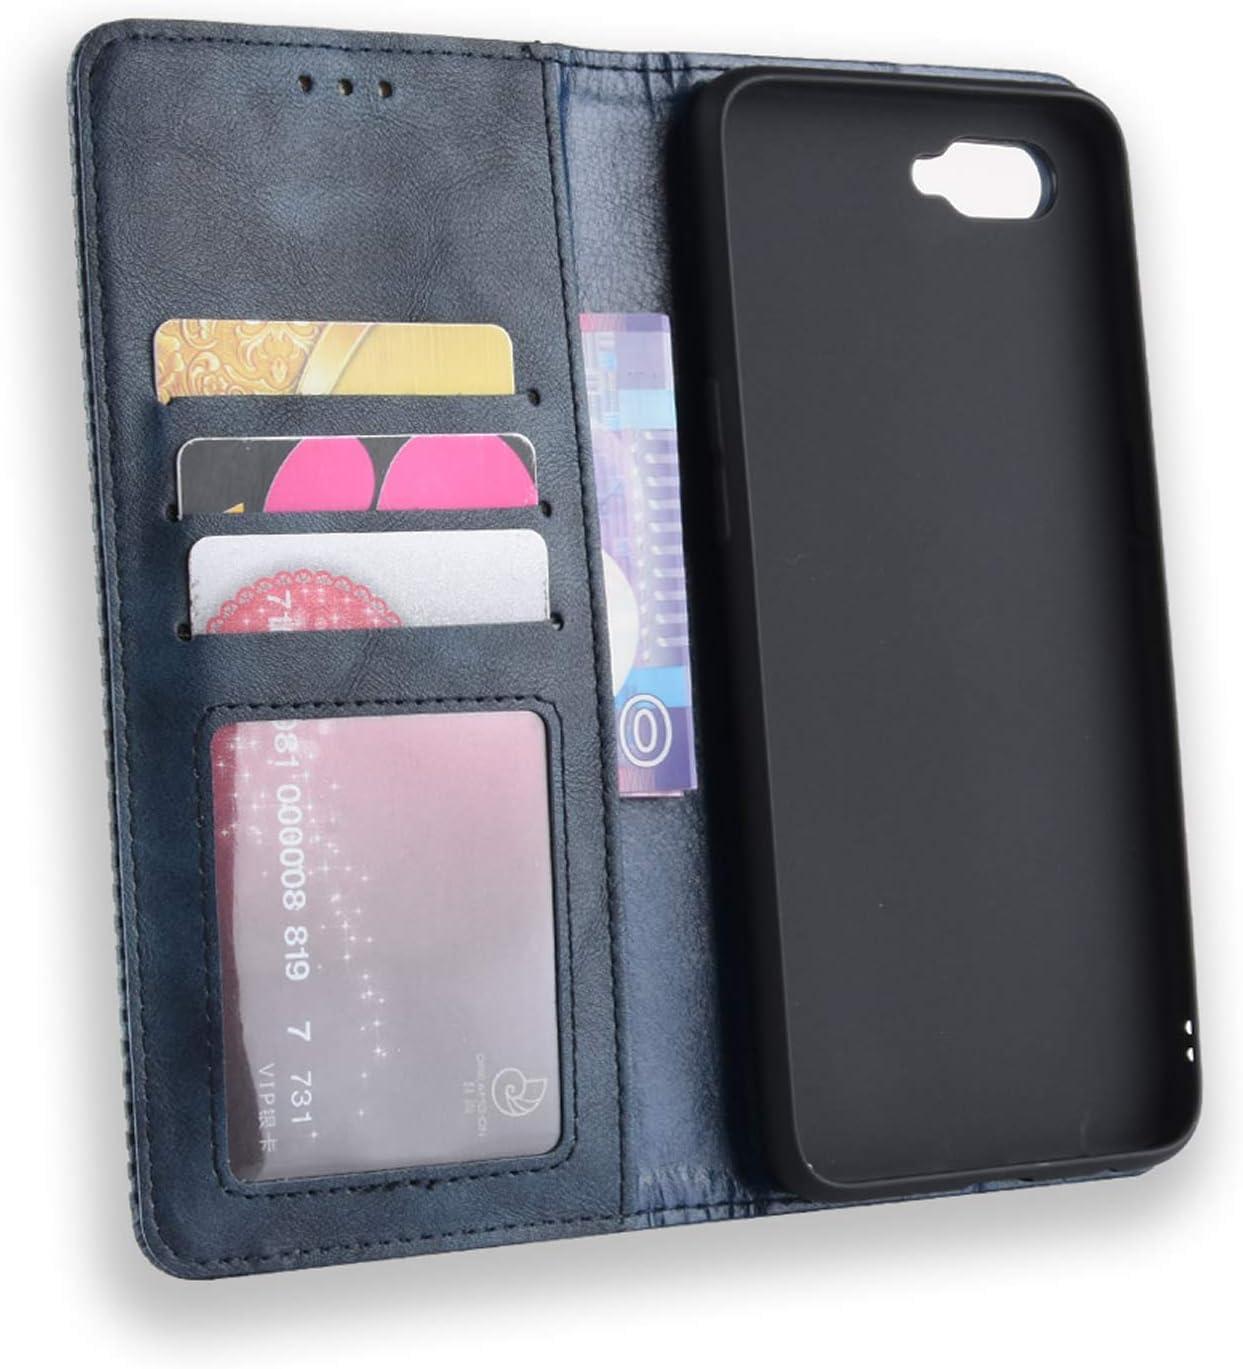 Negro Flip Leather Case Cover Carcasa de Protectora Cuero PU Billetera Cartera Plegable Funda Ranuras de Tarjeta HualuBro Funda para OPPO K1 // OPPO RX17 Neo//OPPO R15X